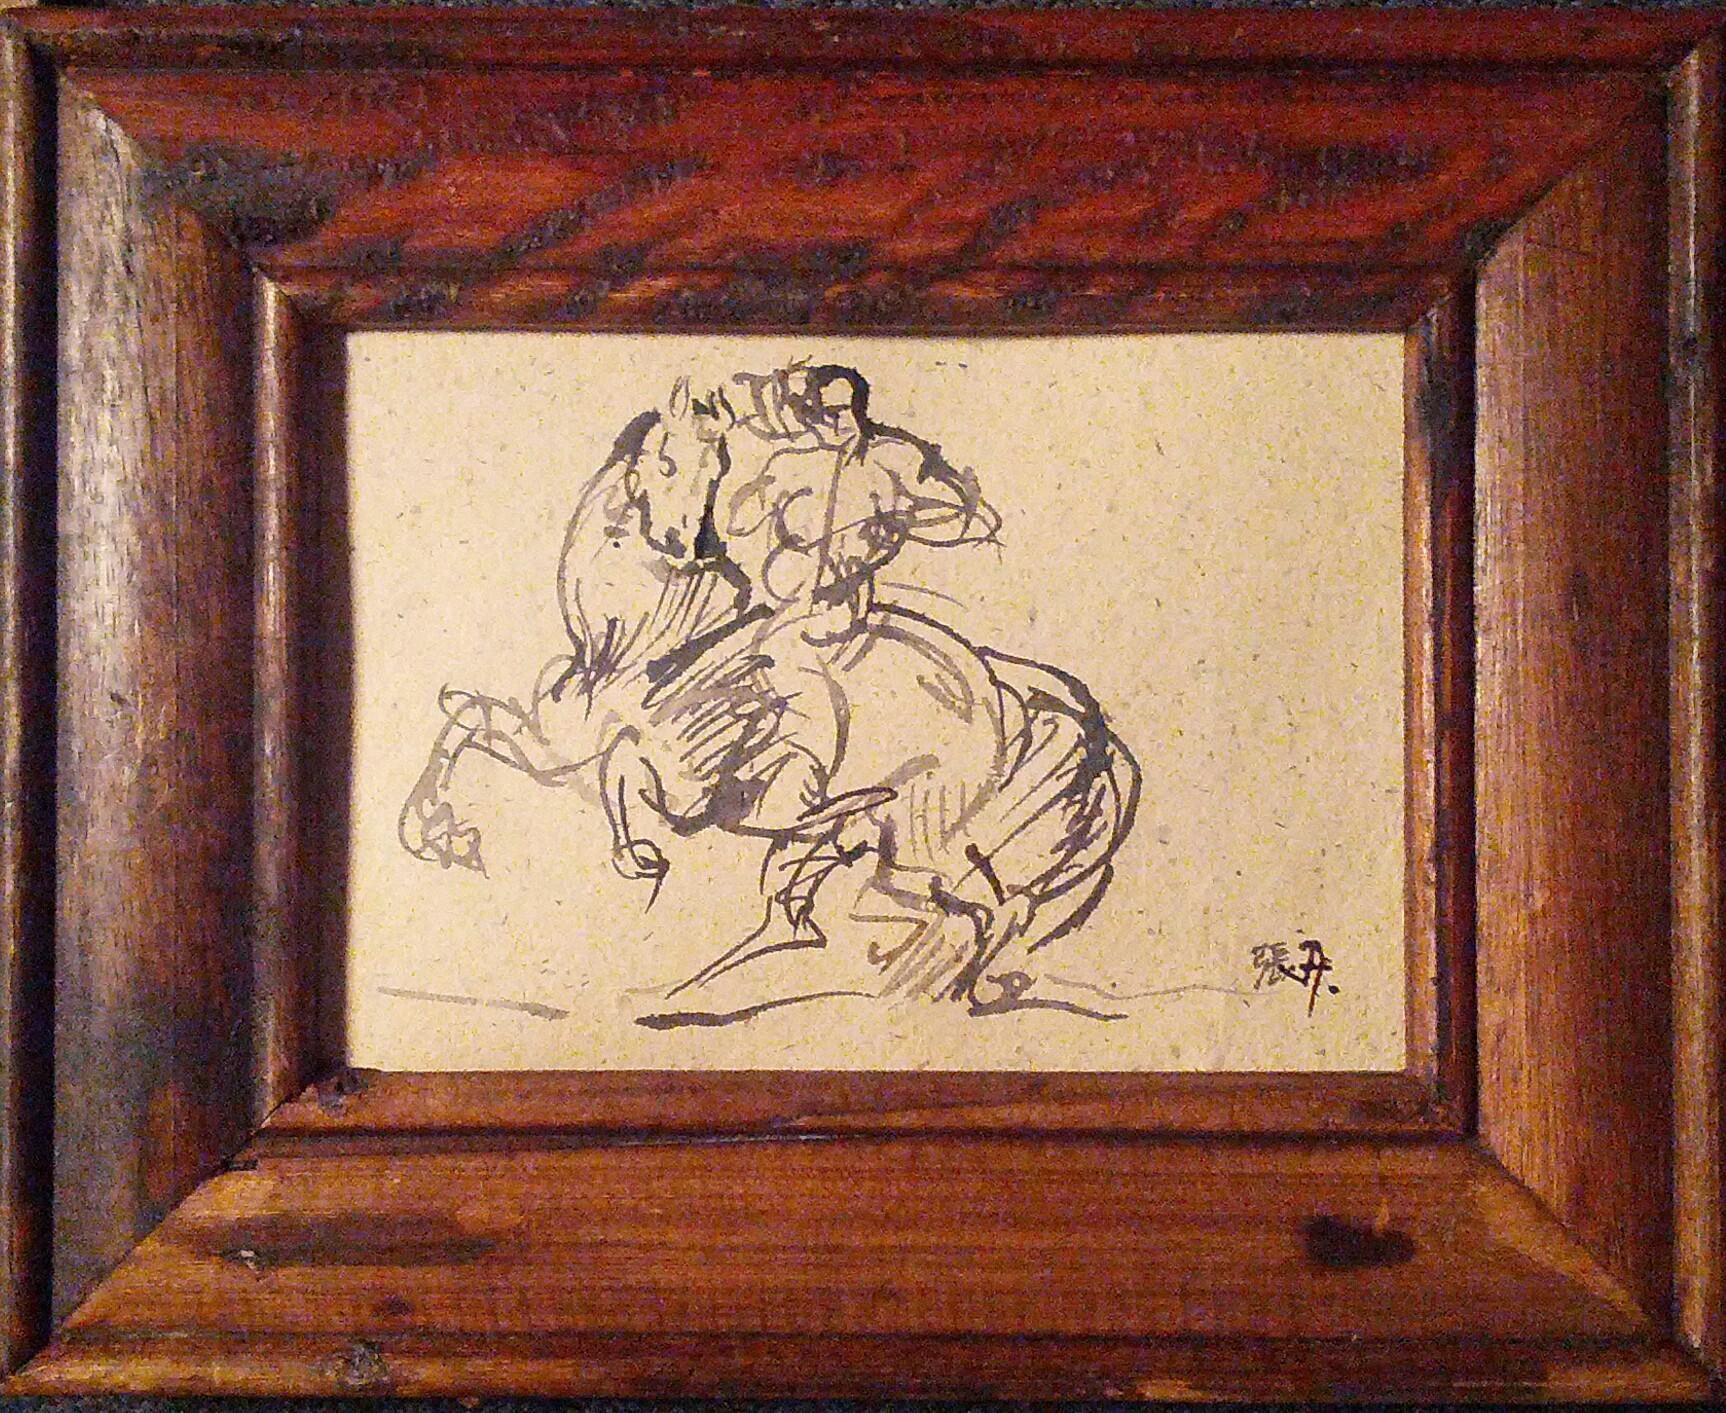 Sketch of Man on Horse, after Gericault